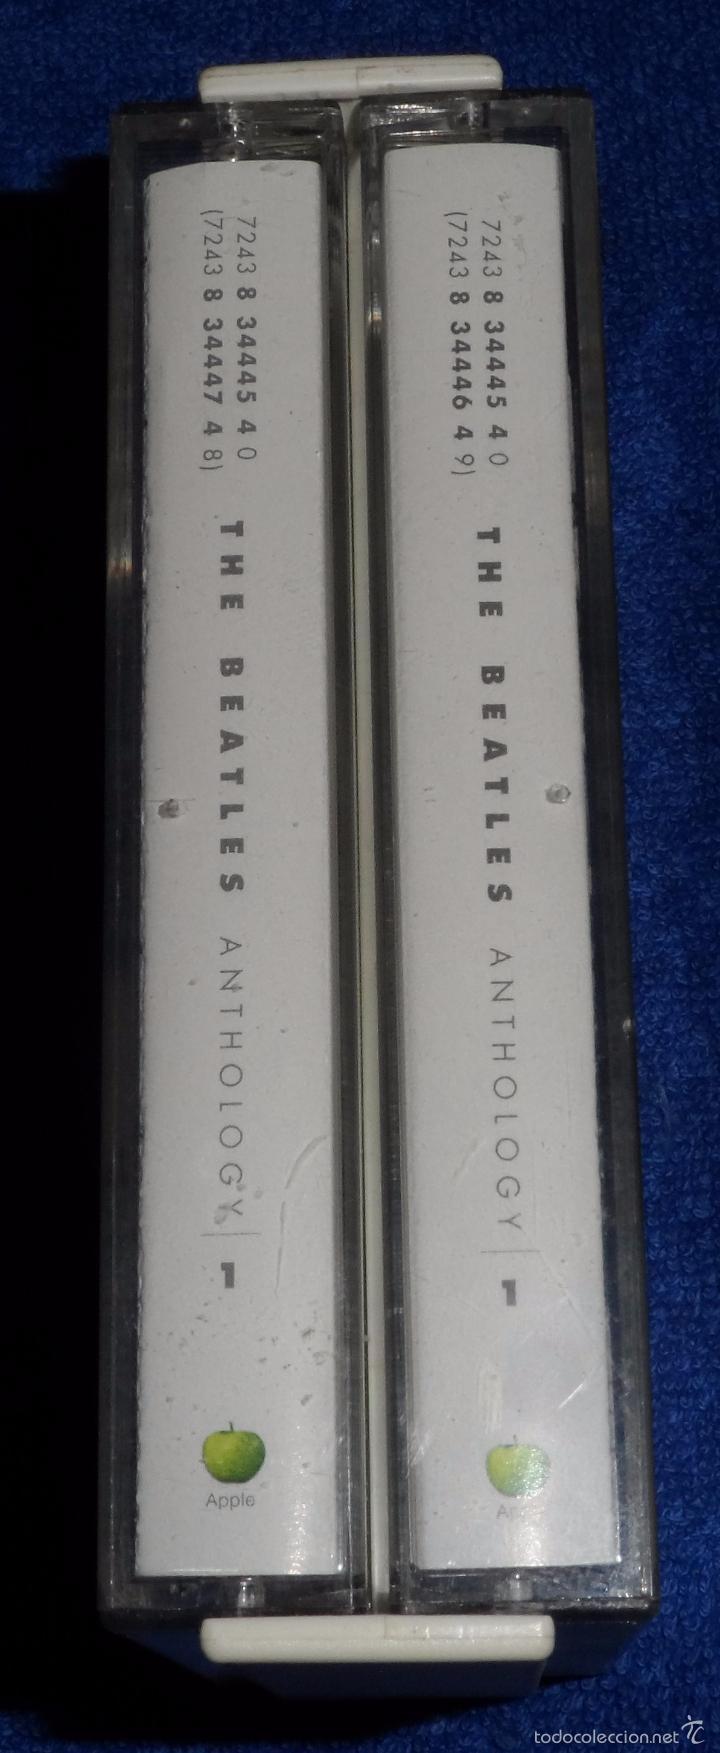 Casetes antiguos: The Beatles - Anthology - Casete doble - Foto 4 - 58537107